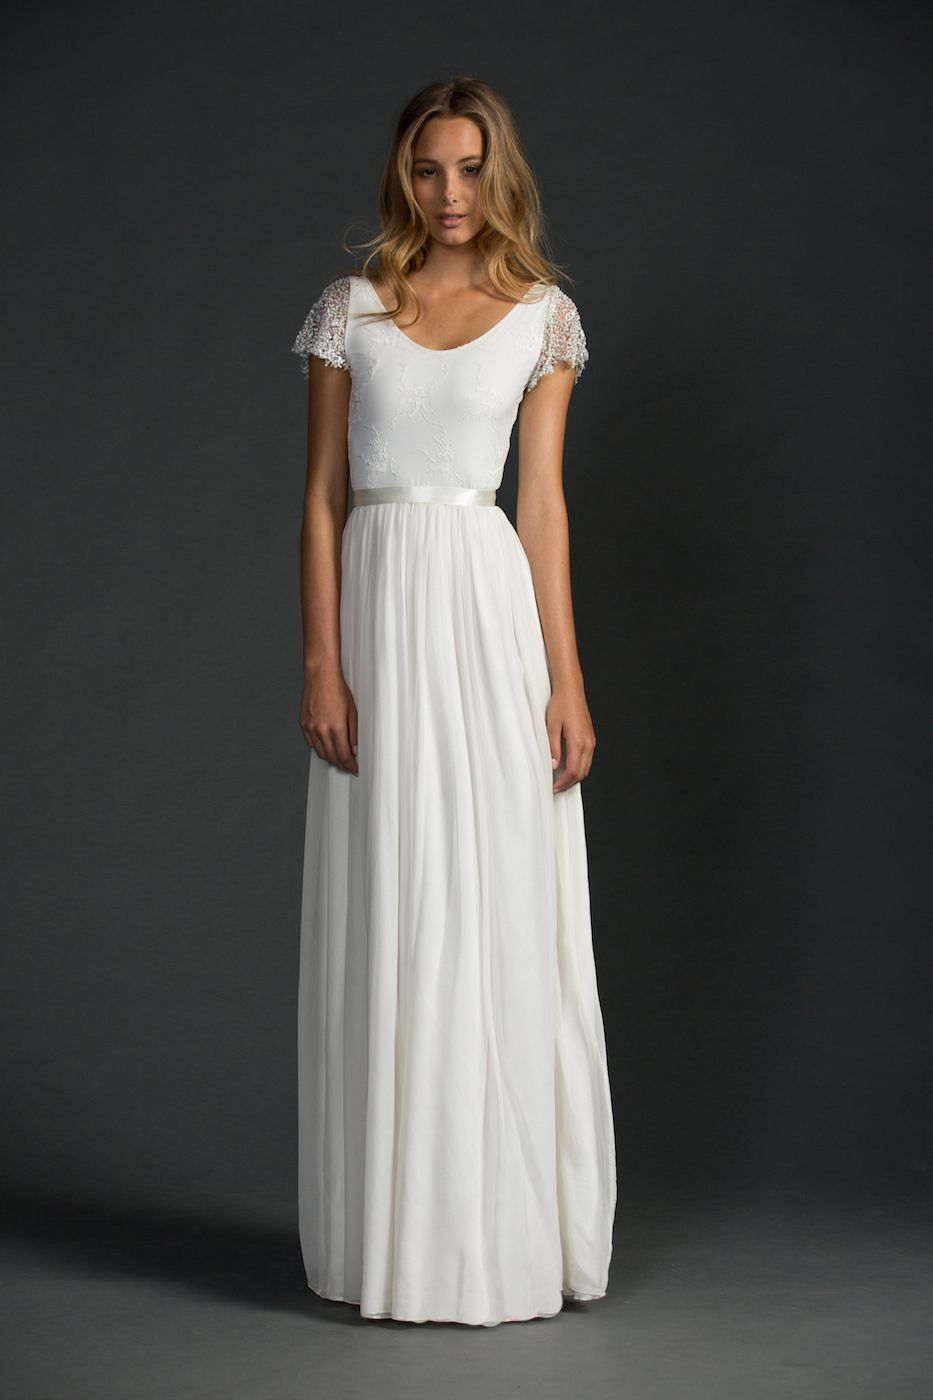 Pin by claudia g on vestidos matri pinterest wedding dresses